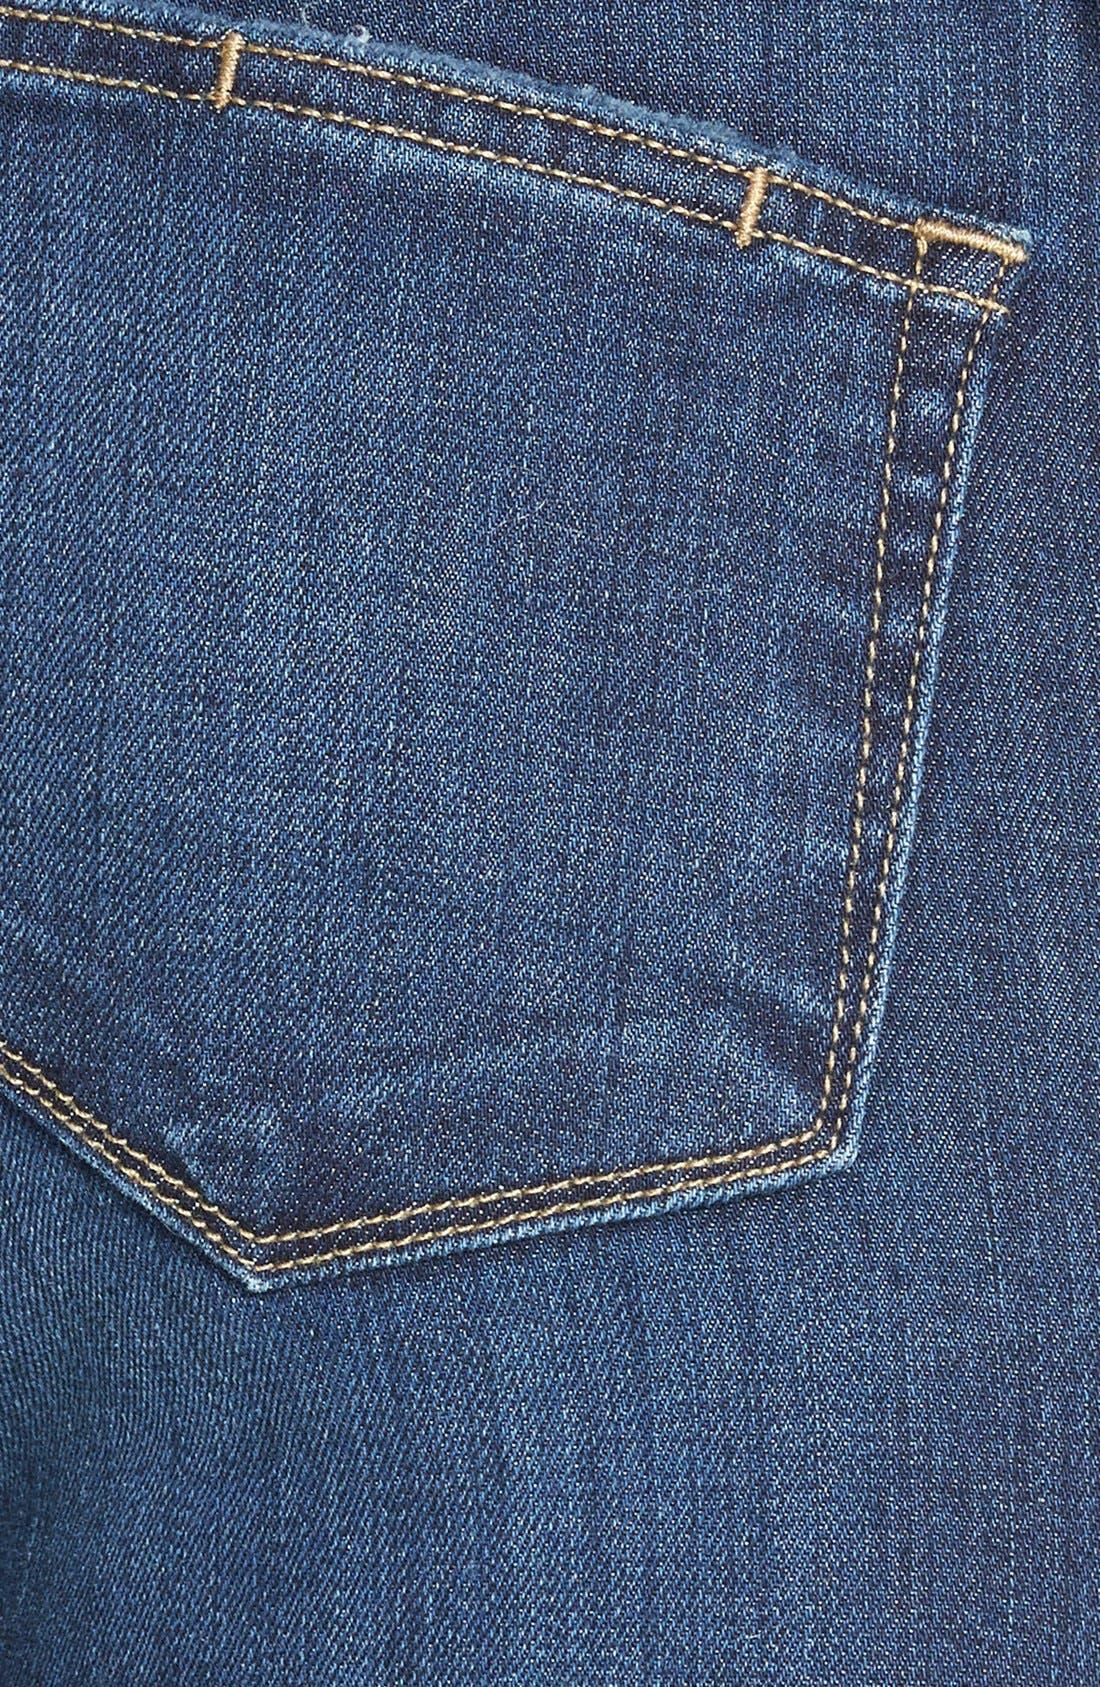 Alternate Image 3  - Paige Denim 'Skyline' Ankle Peg Skinny Jeans (Lyric Deconstructed)